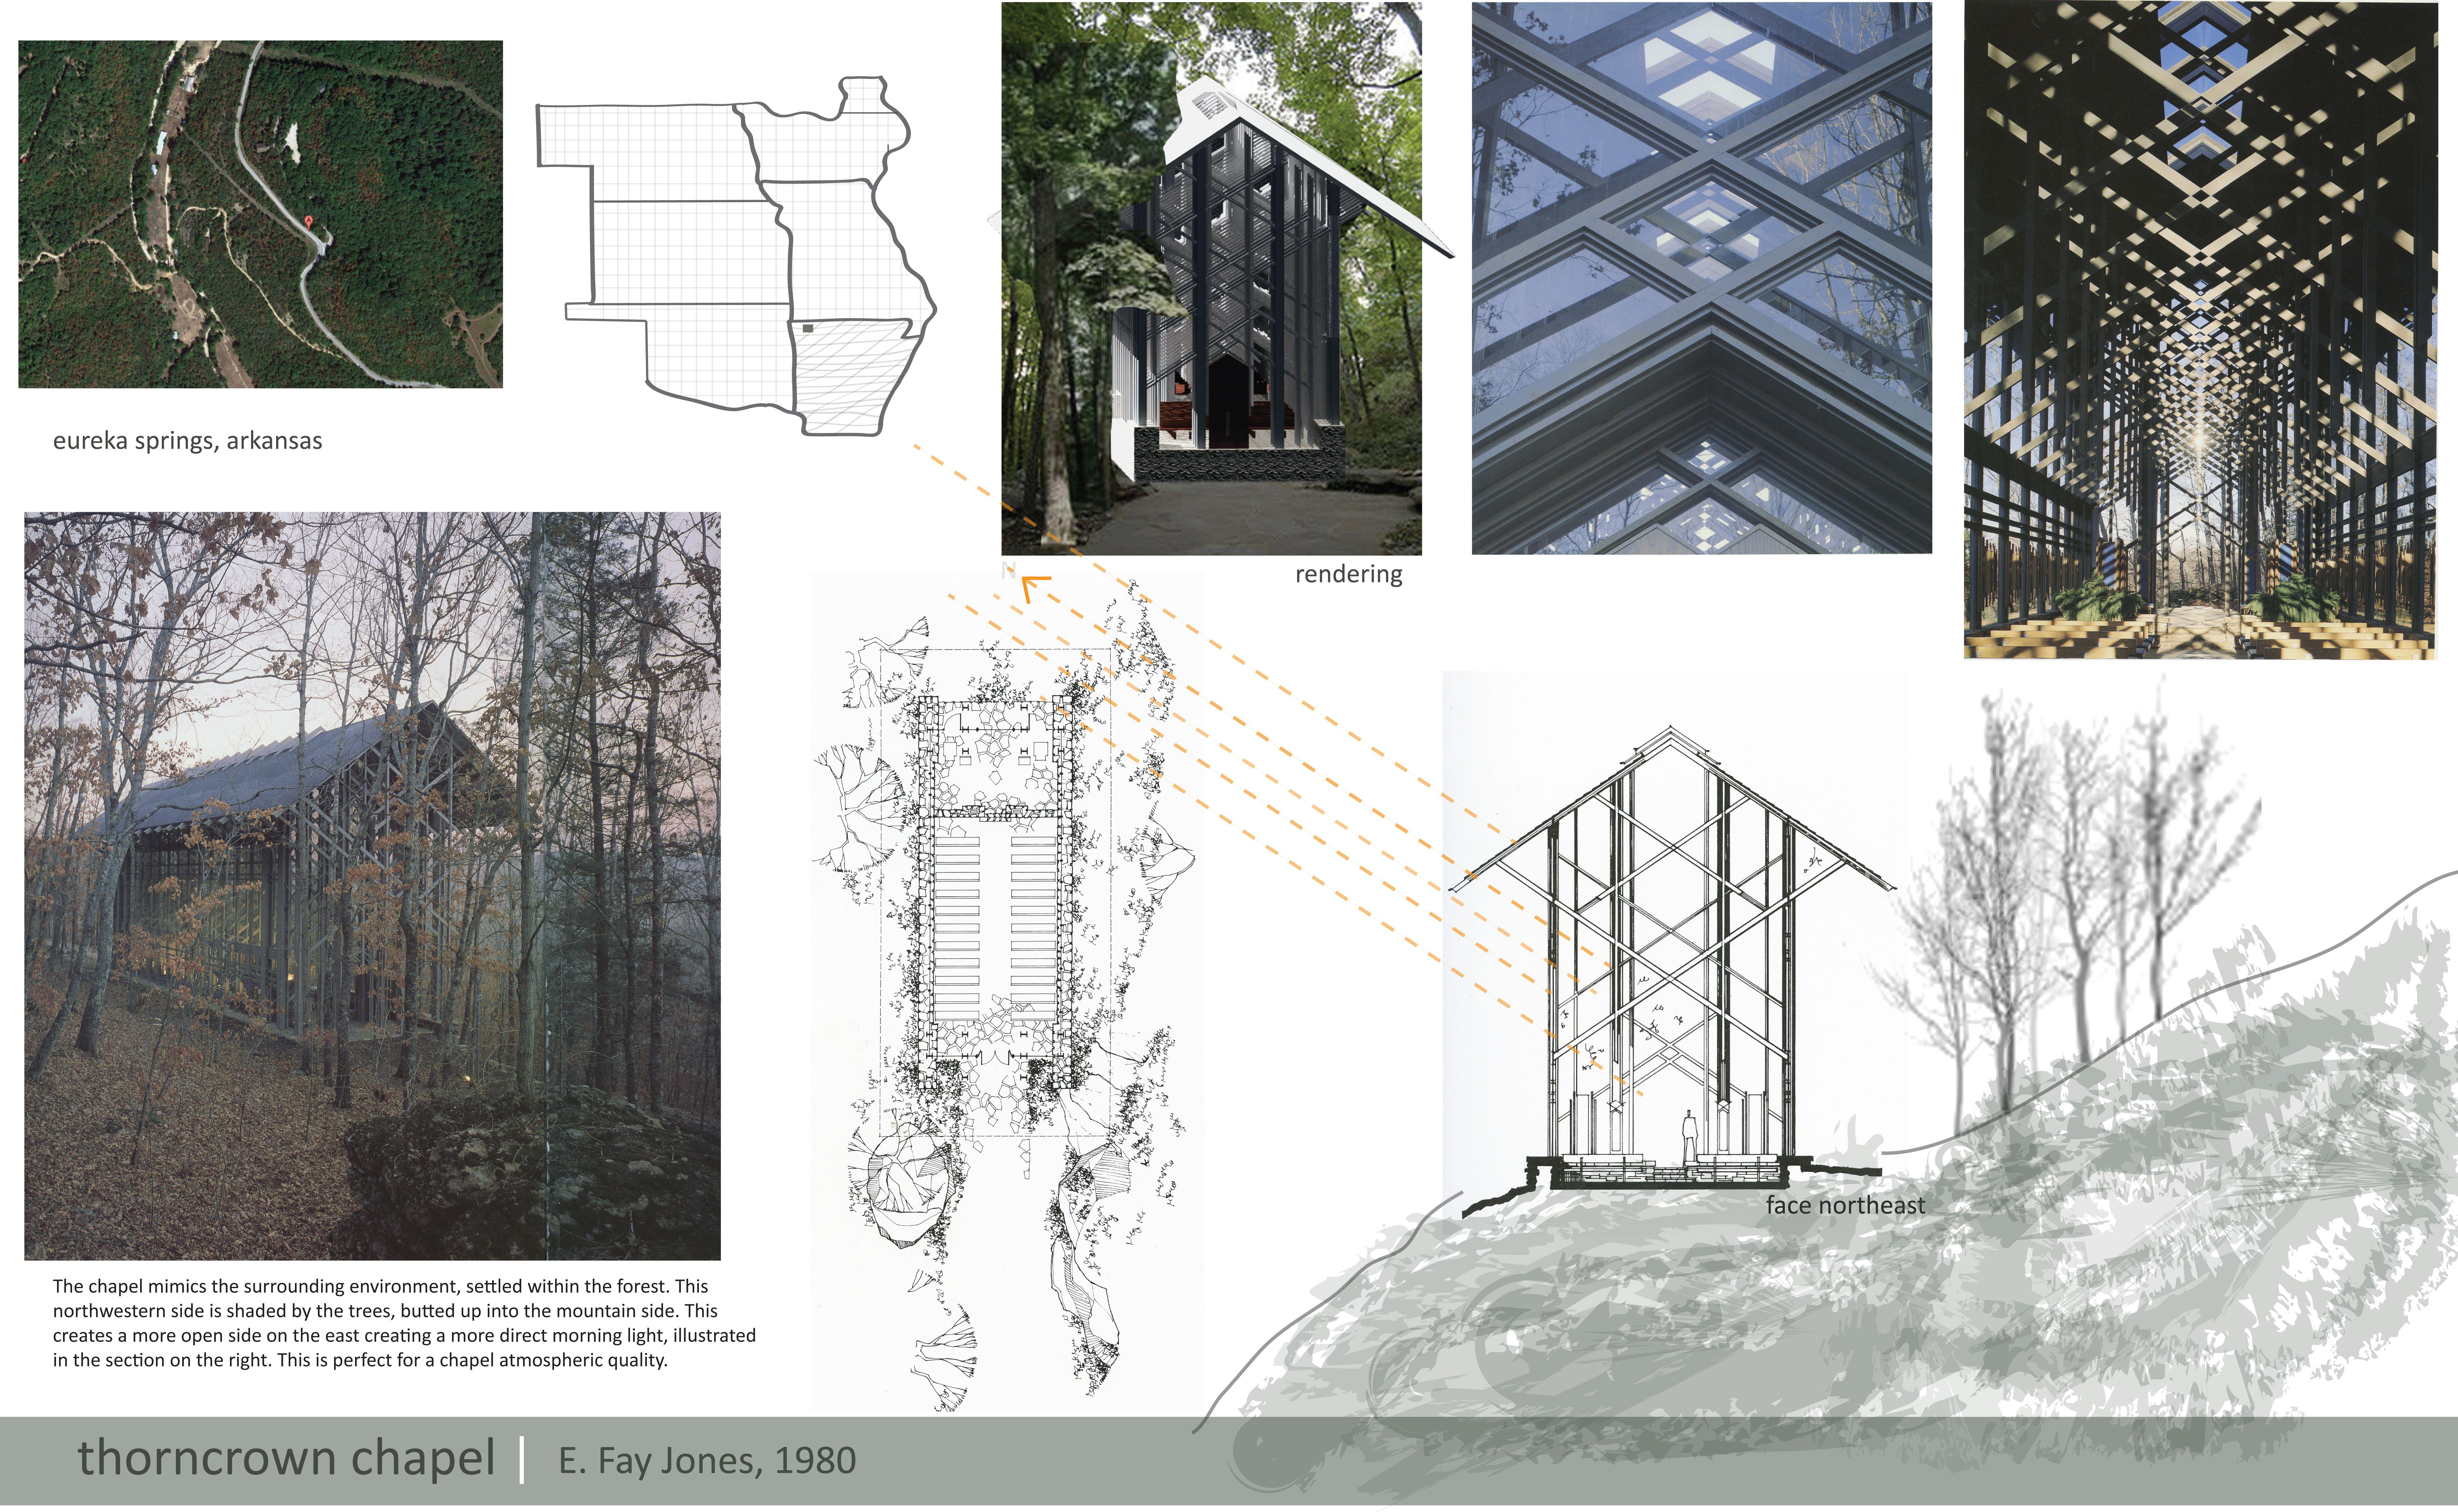 Thorncrown Chapel By E Fay Jones Thorncrown Chapel Architecture Chapel